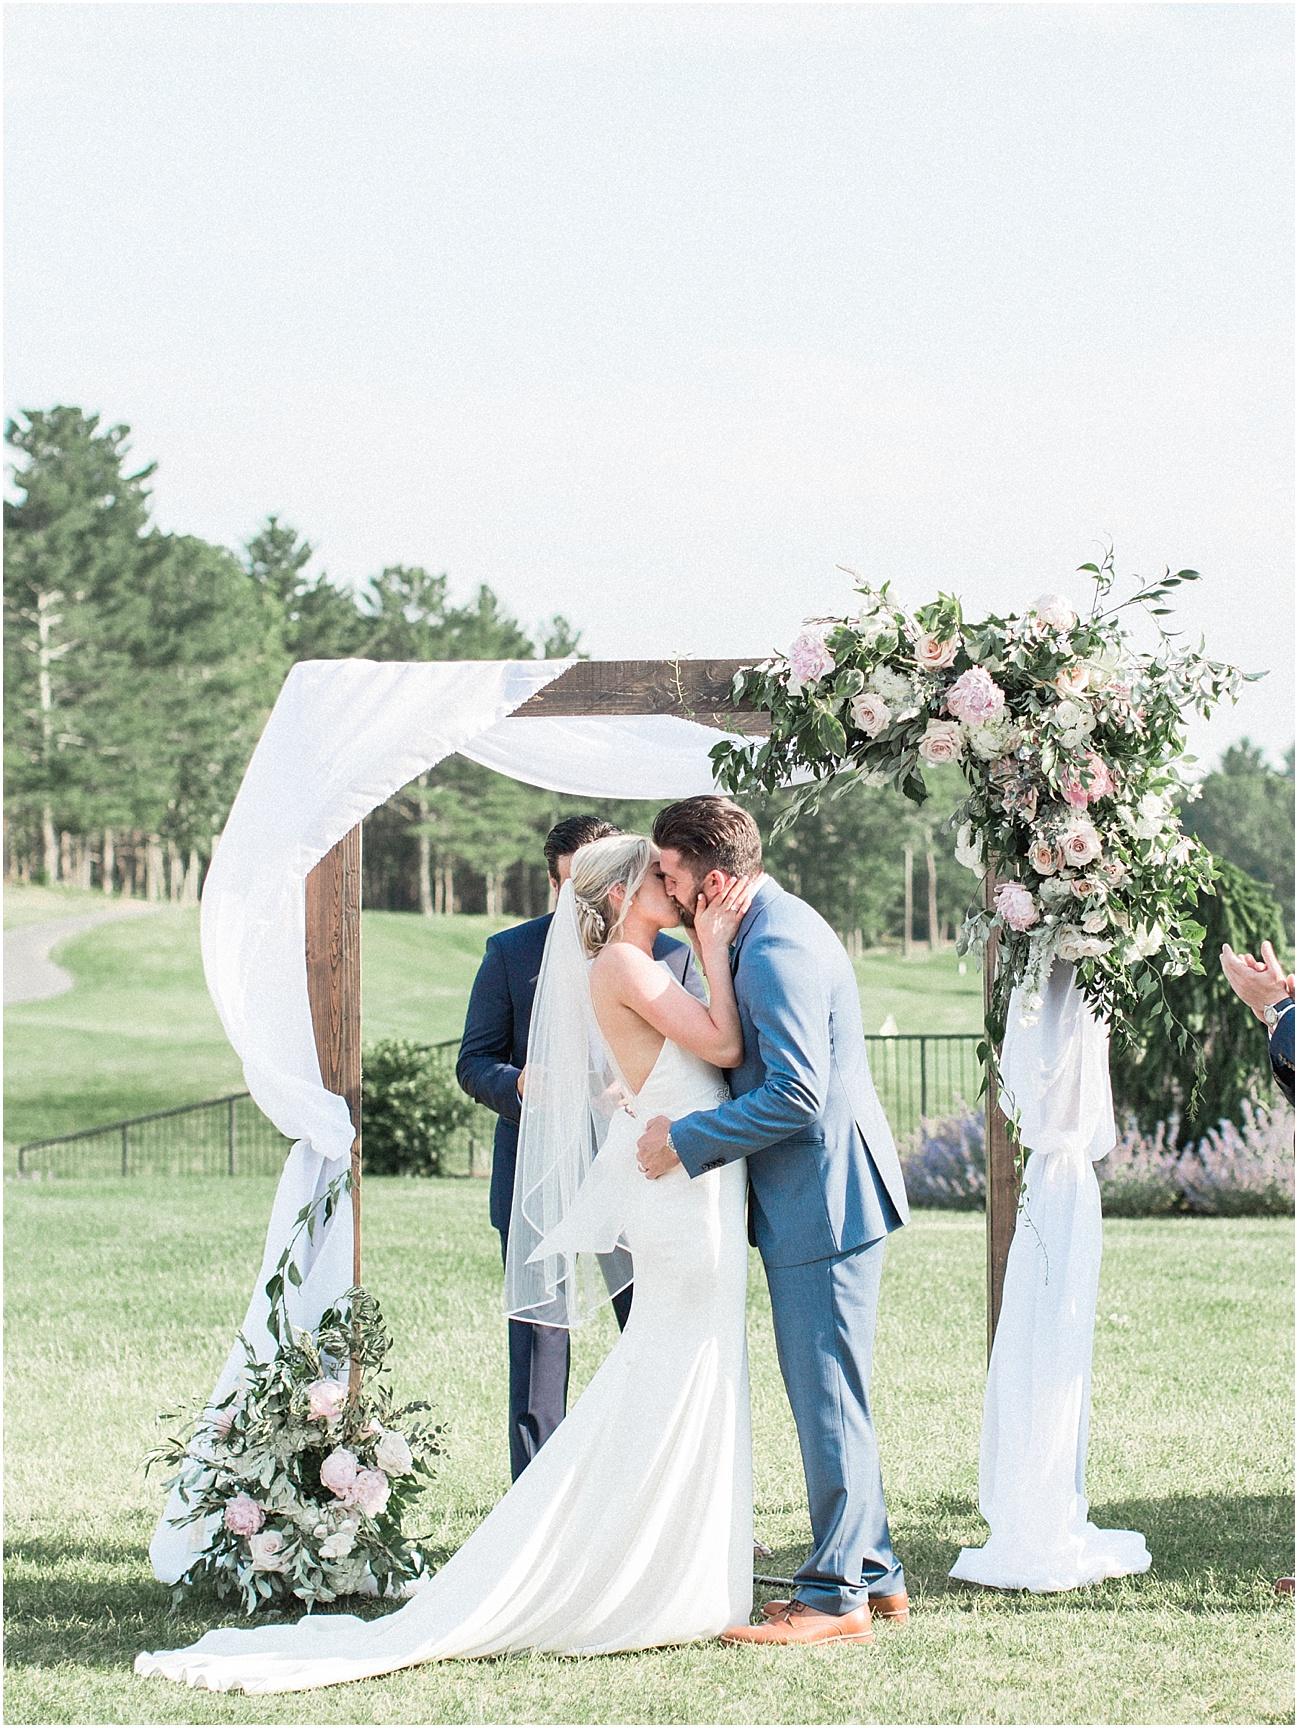 lindsey_paul_indian_pond_country_club_wild_dahlia_brewster_gardens_plymouth_cape_cod_boston_wedding_photographer_meredith_jane_photography_photo_0389.jpg